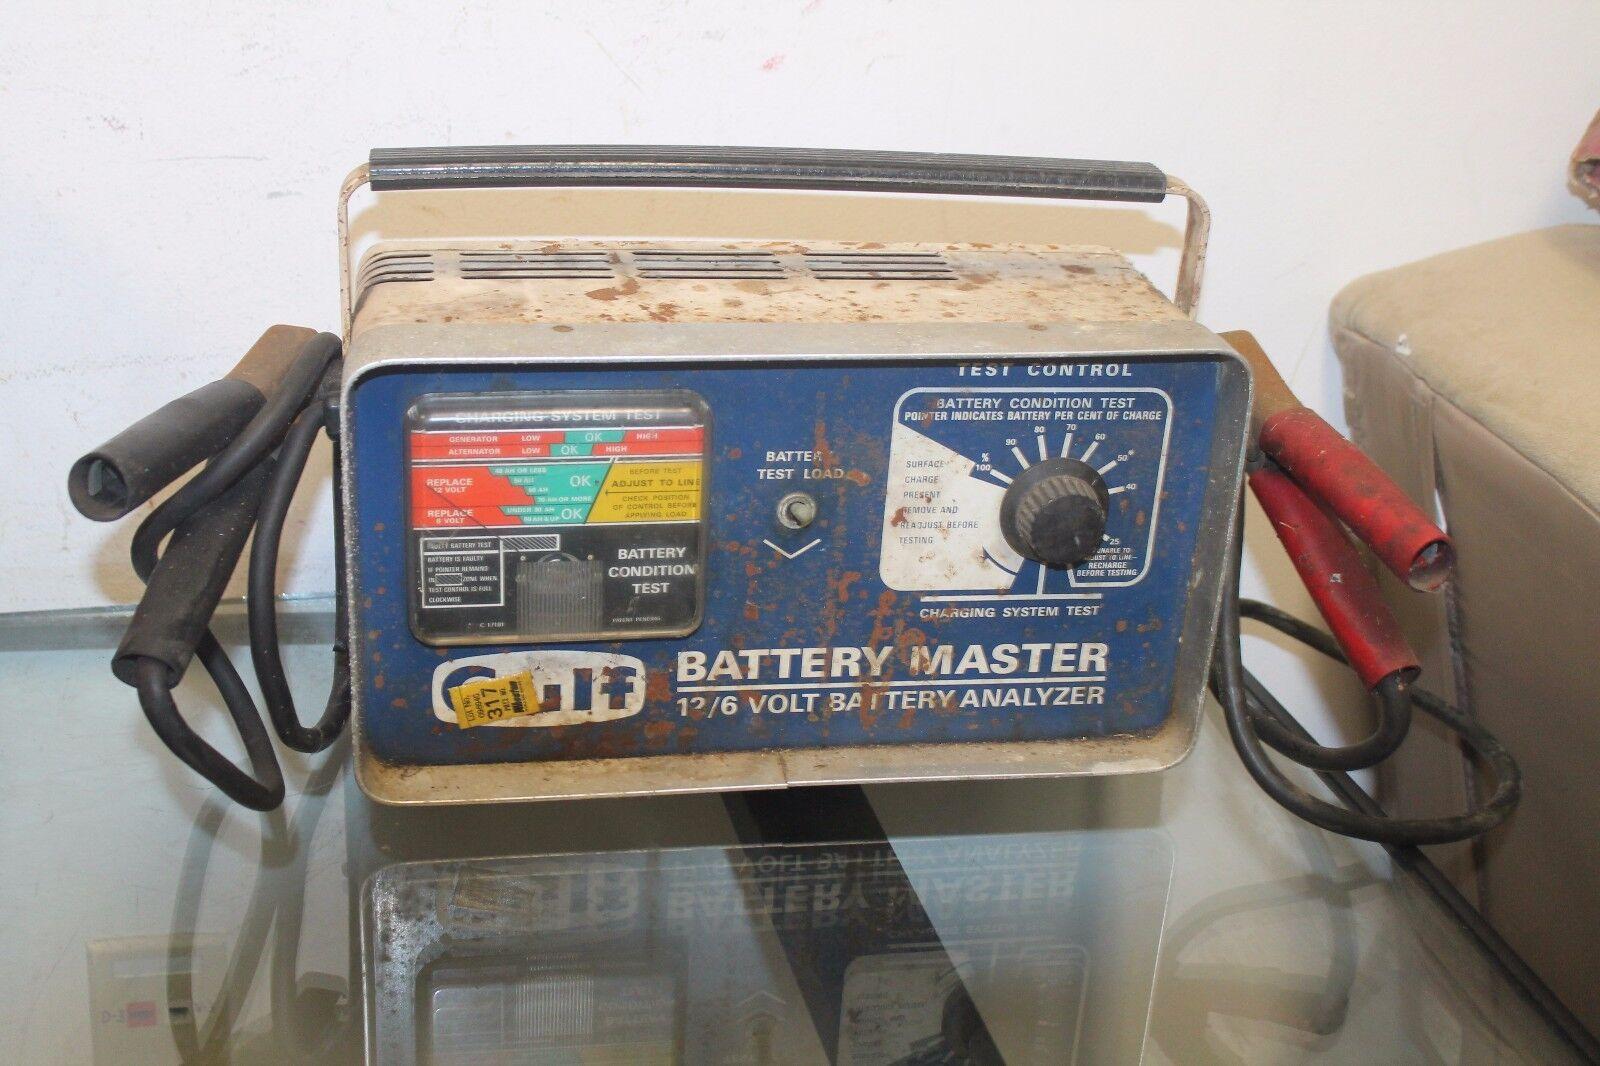 Gulf Oil Battery Master 12/6 Volt Battery Analyzer VINTAGE AUTOMOTIVE AUTO TOOL